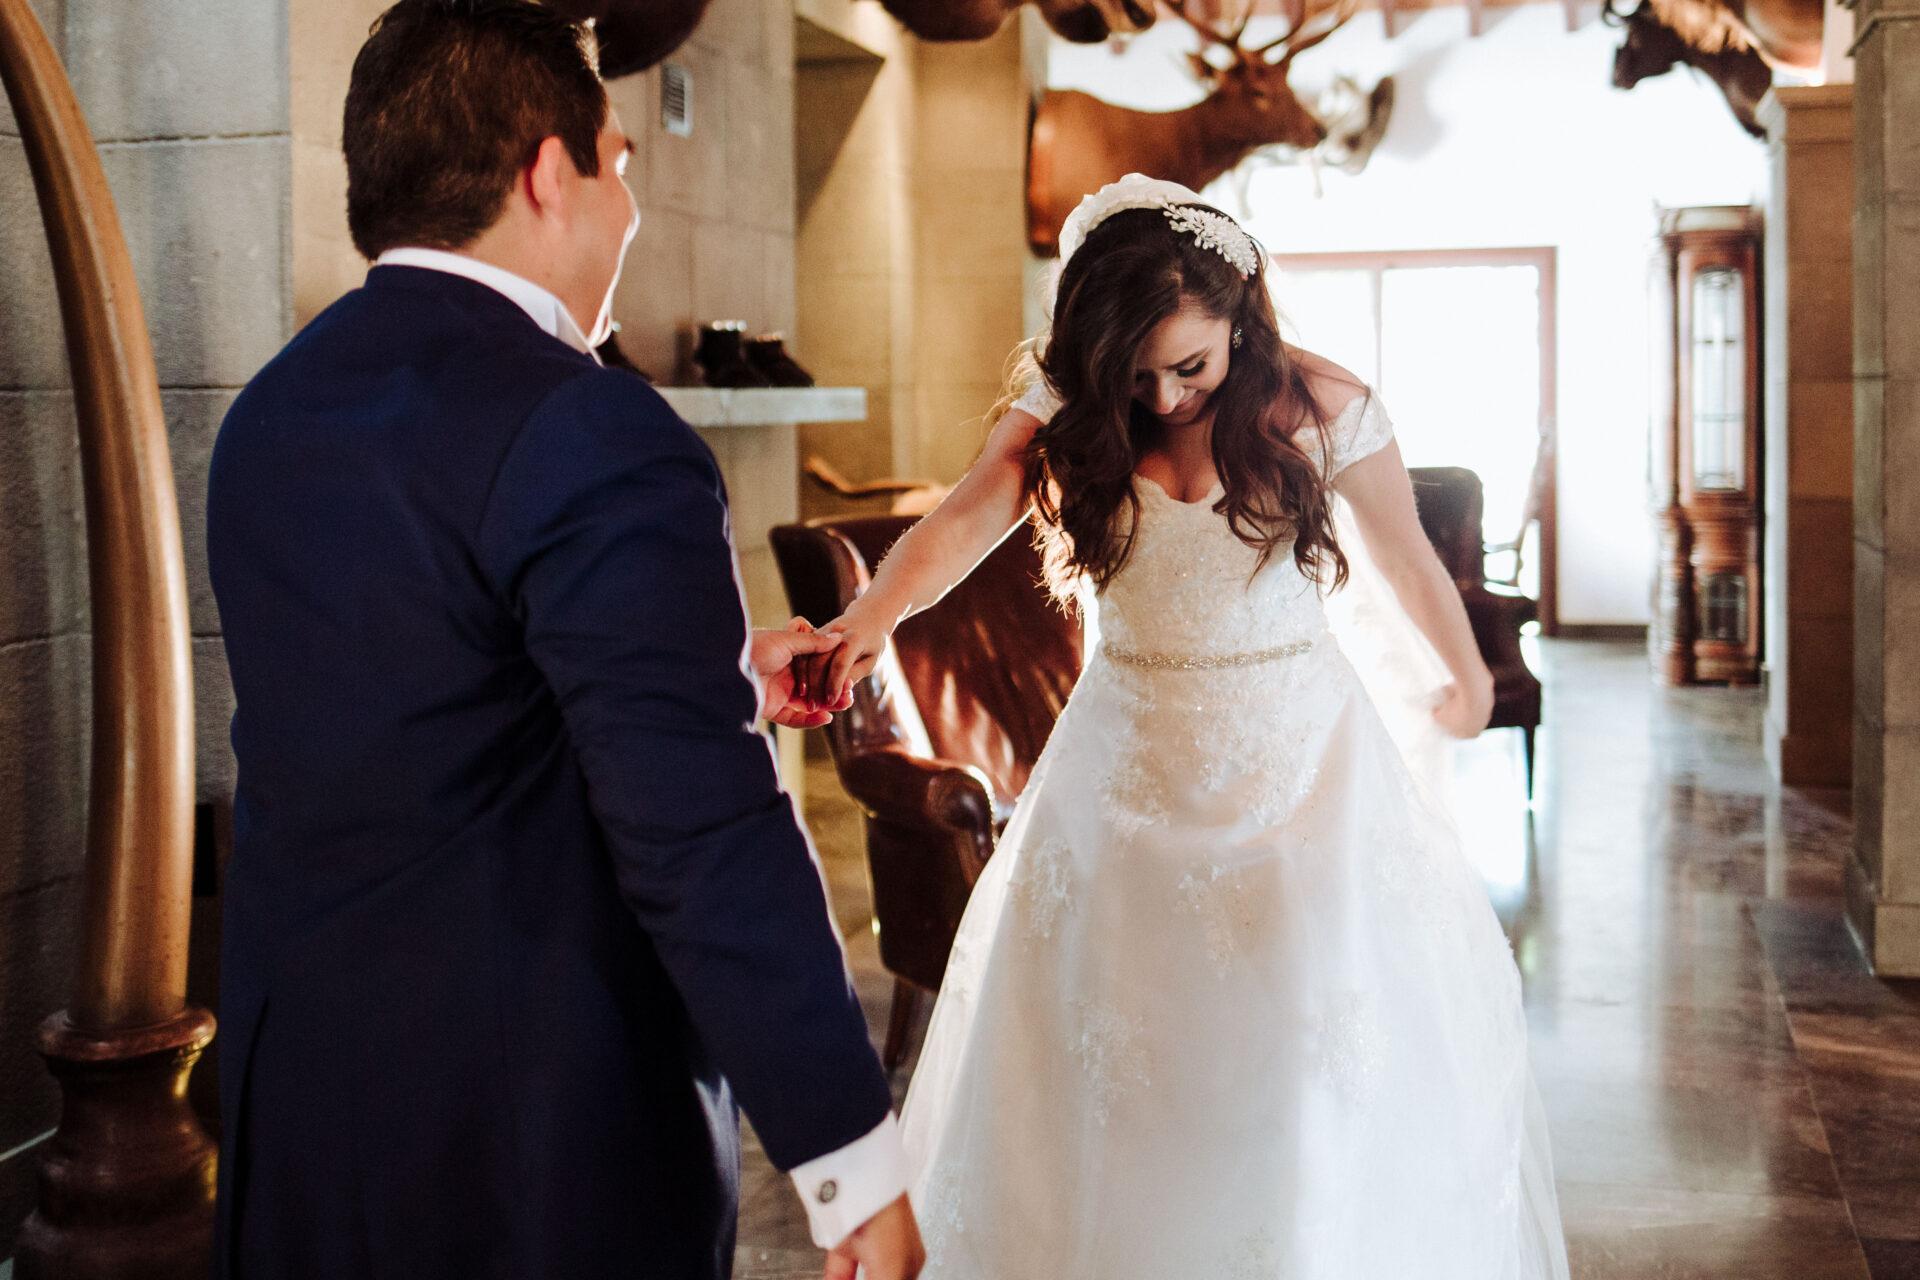 javier_noriega_fotografo_bodas_torreon_coahuila_zacatecas_wedding_photographer19a